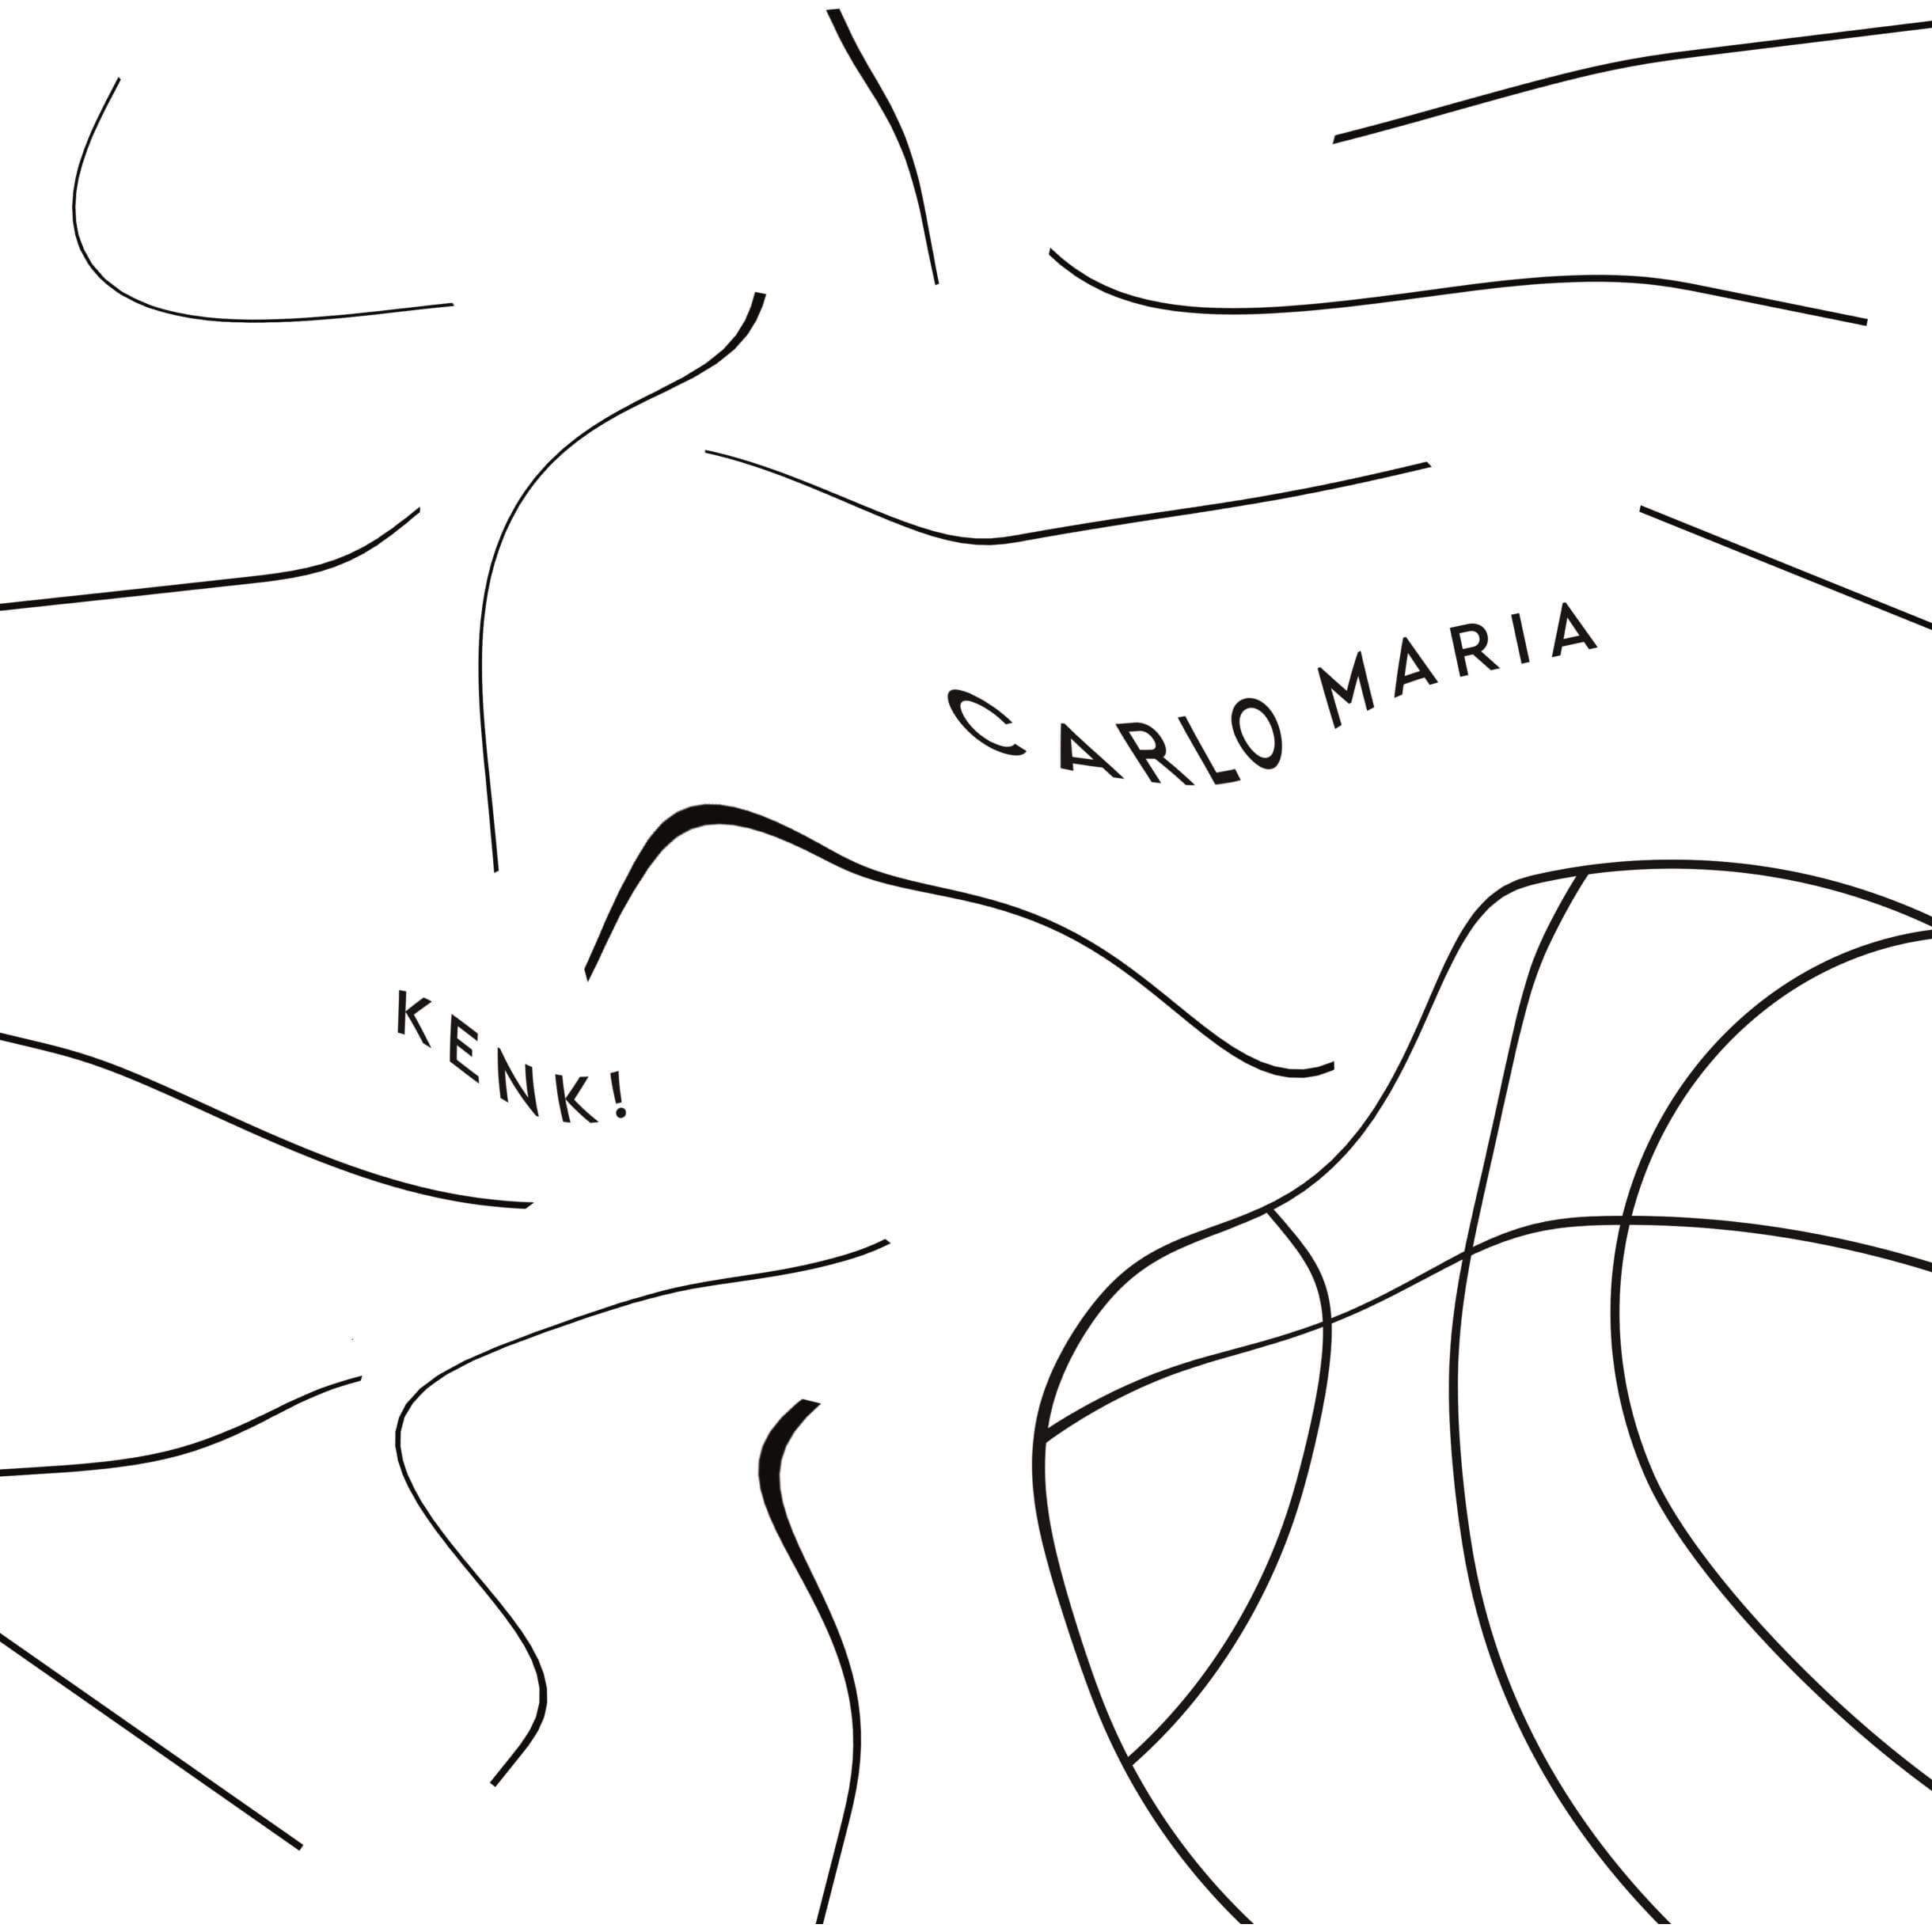 Carlo Maria - Kenk! (Brutaz)